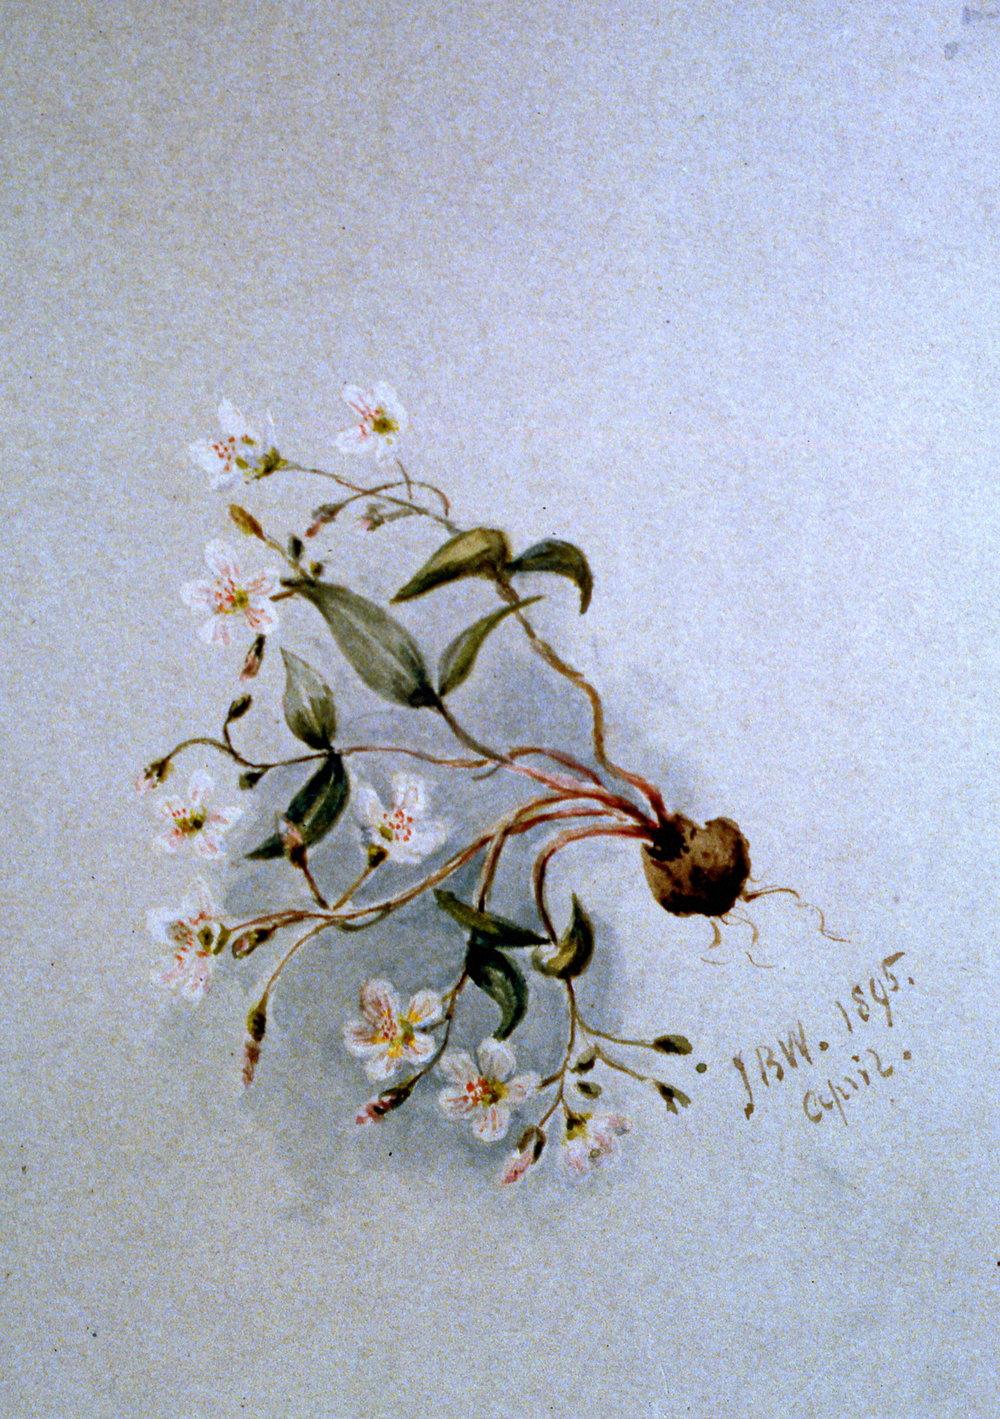 Untitled (Claytonia Carolianum, Doderatheon Jeffrey), 1895, Julia Bullock Webster,watercolour on paper, 25.5 x 35.5 cm, 1982.02.18. Gift of Mrs. Barbara Steel.